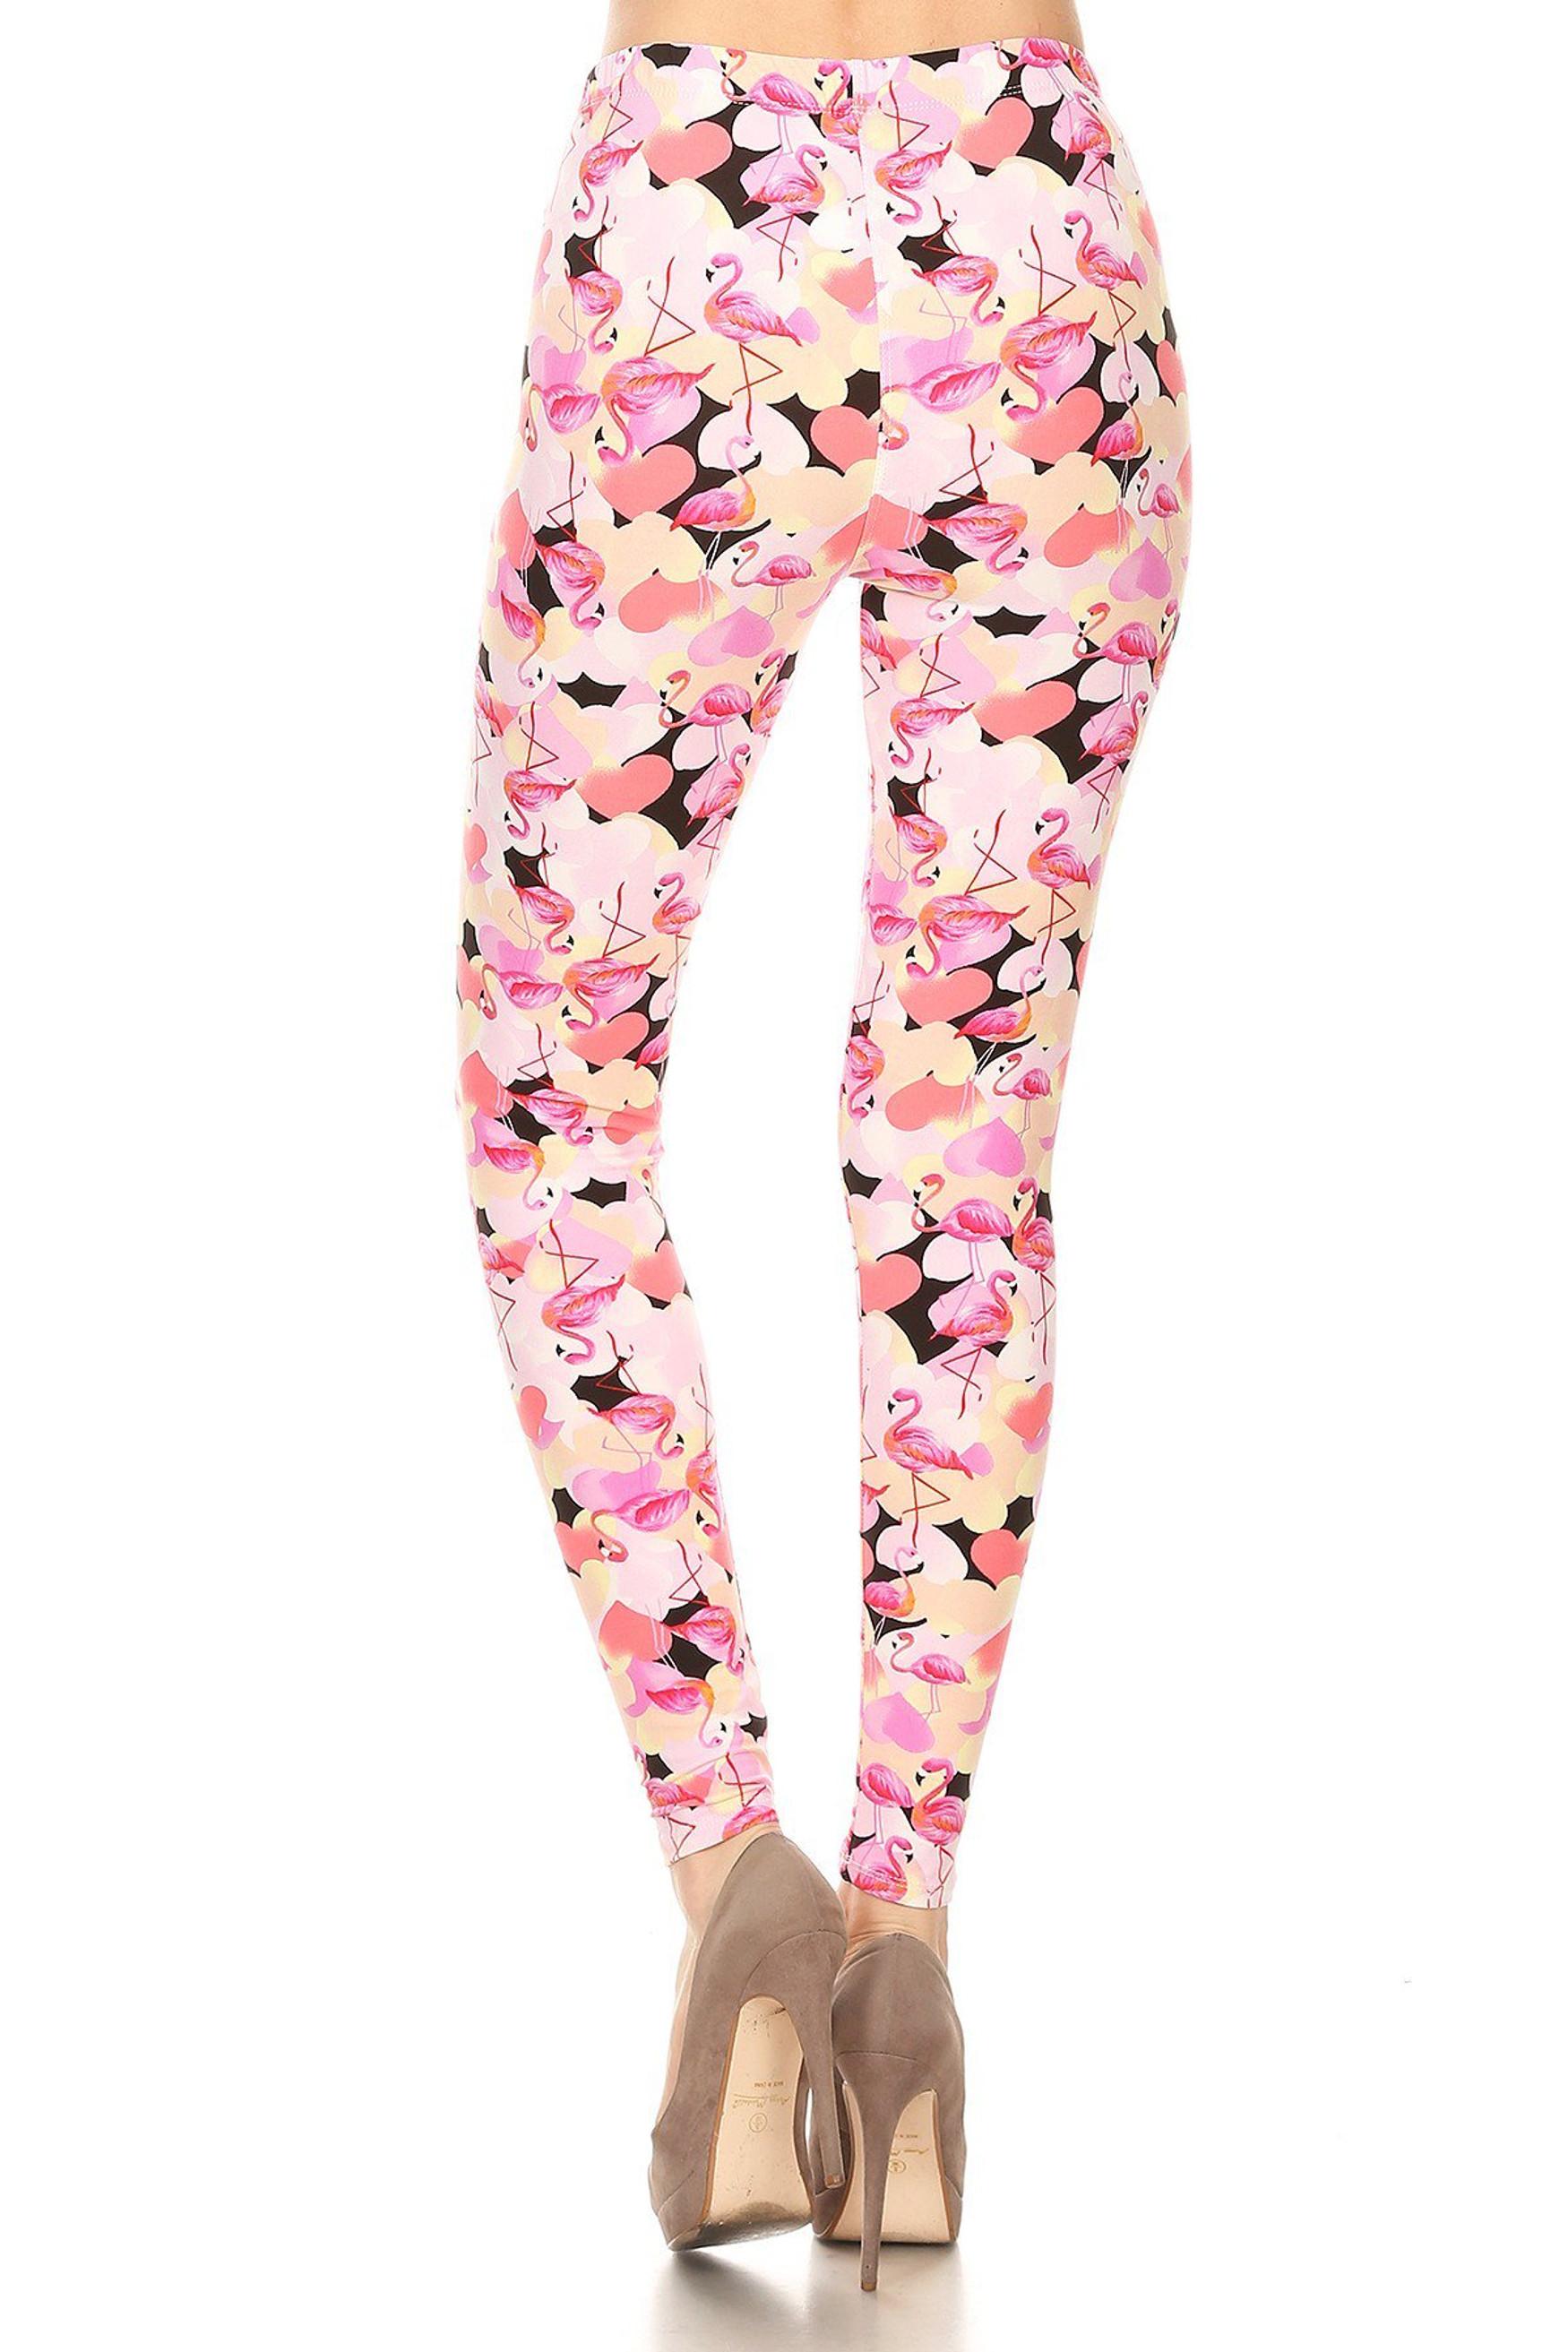 Back of Soft Brushed Gorgeous Pink Flamingos Plus Size Leggings - 3X-5X